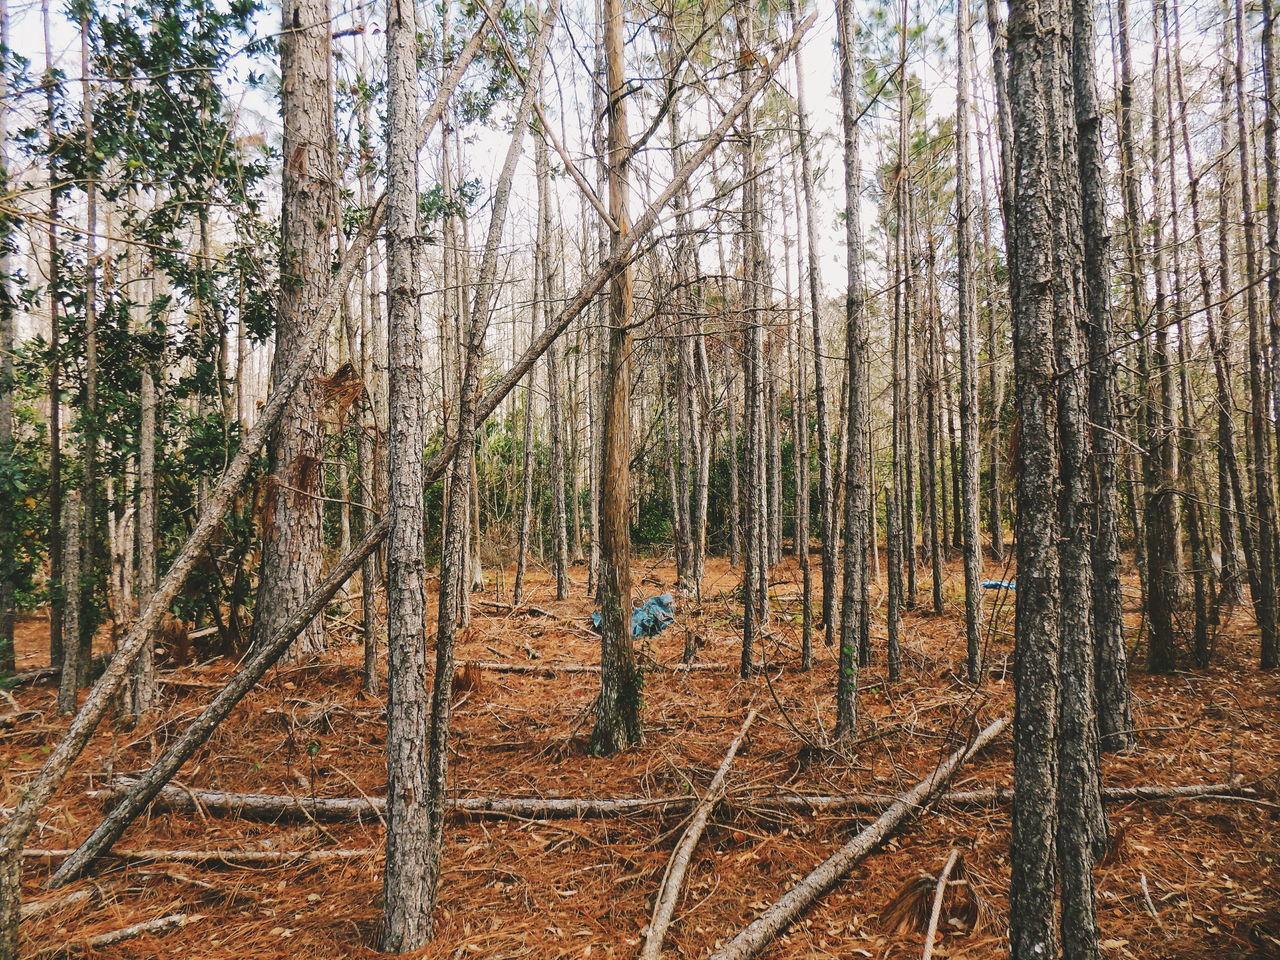 MAN ON TREE TRUNK